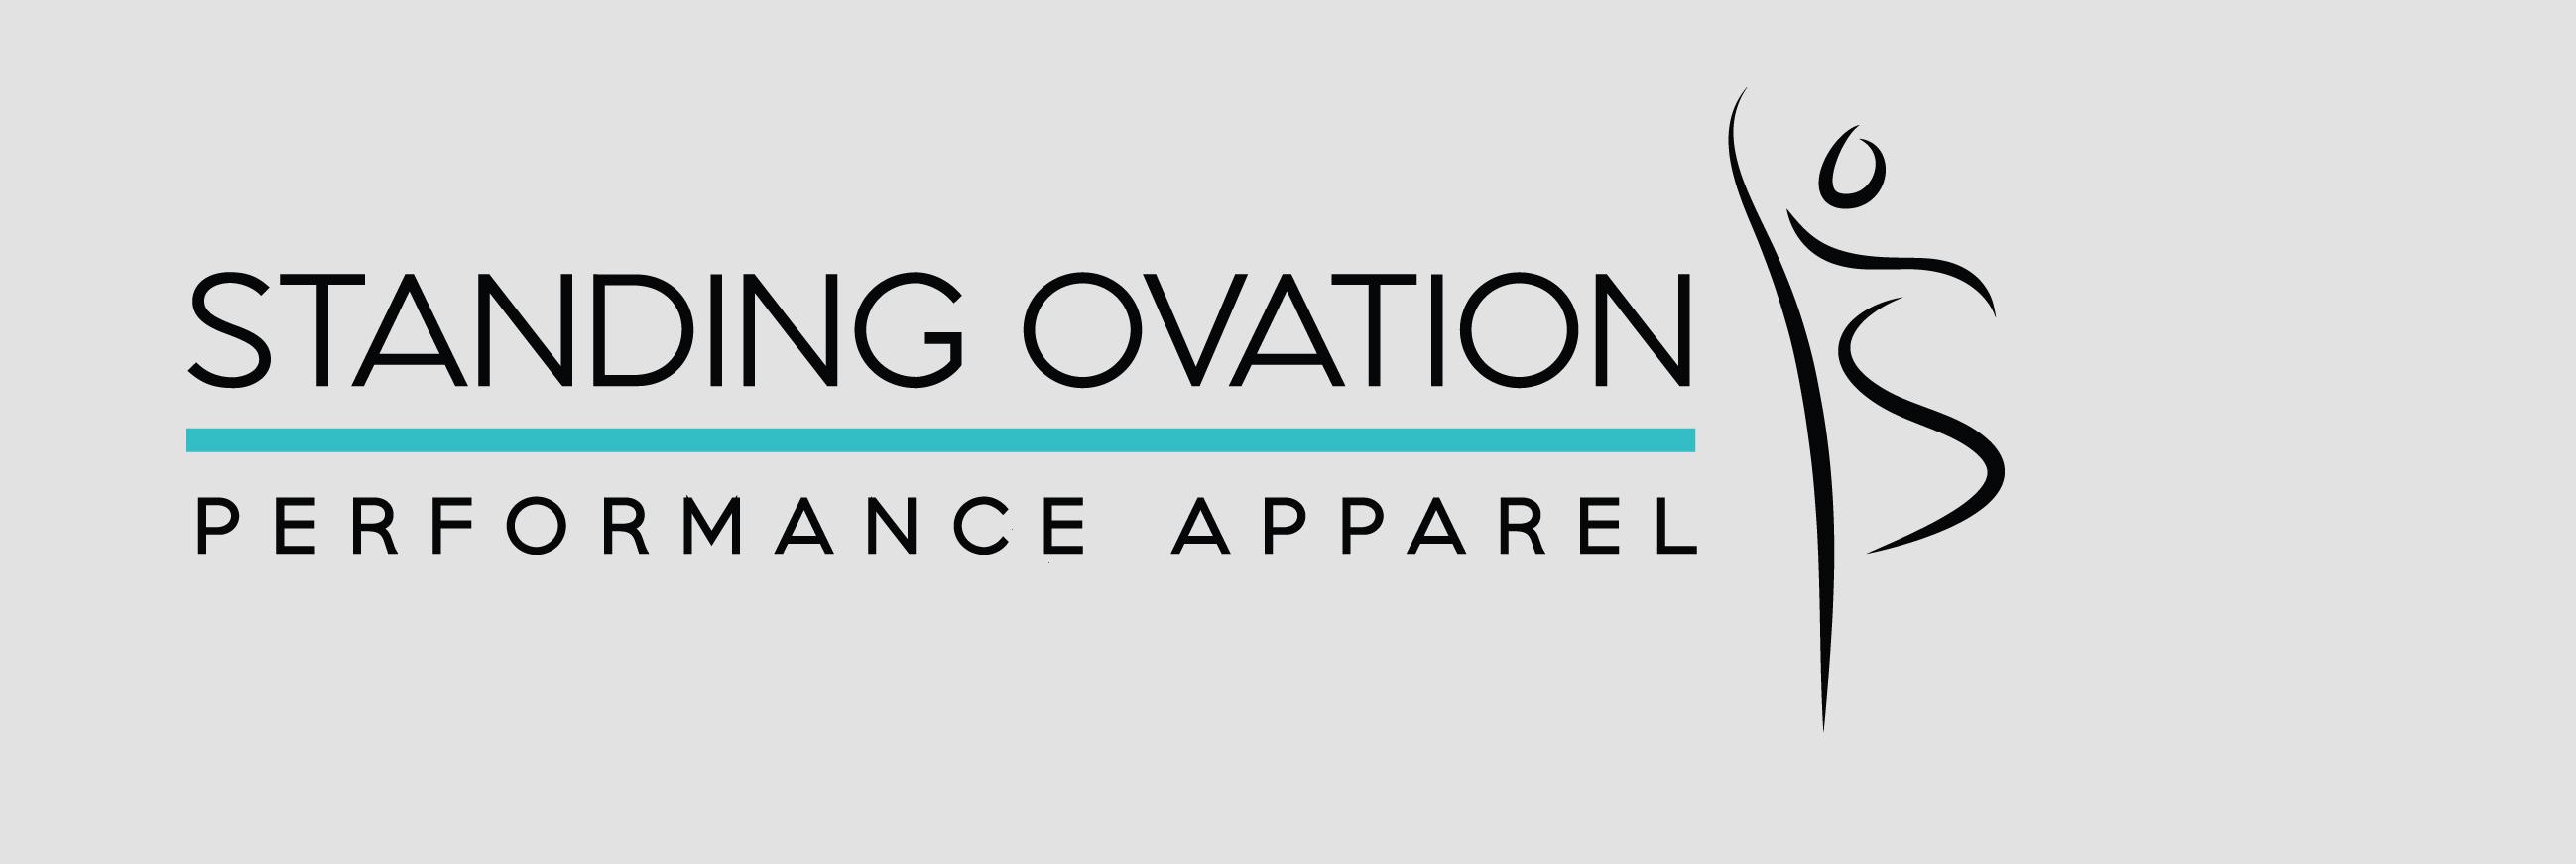 Standing Ovation Performance Apparel